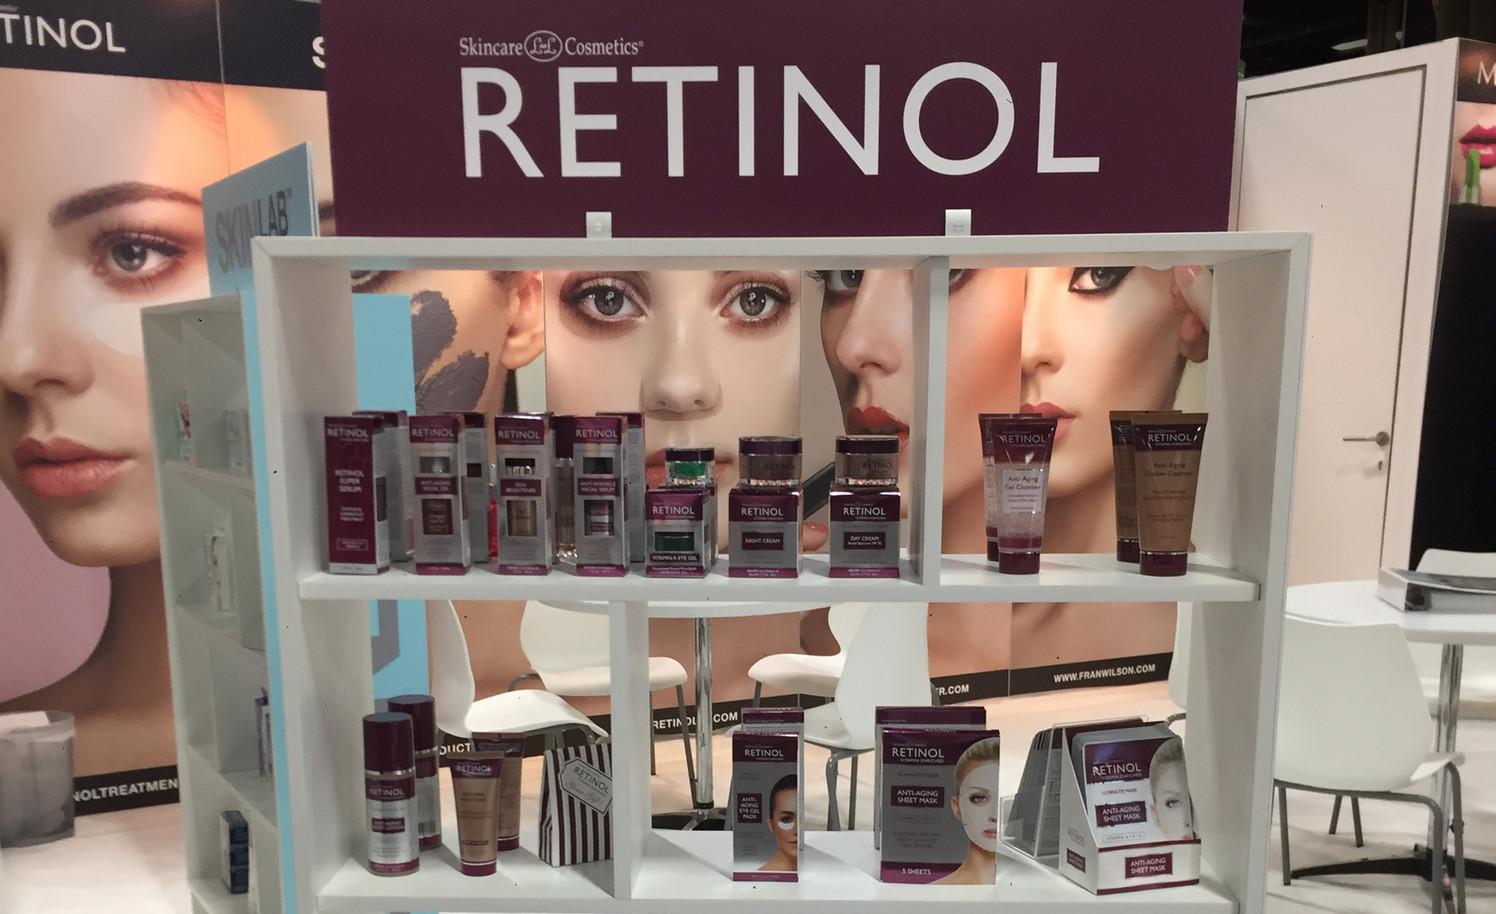 Retinol Skincare Collections